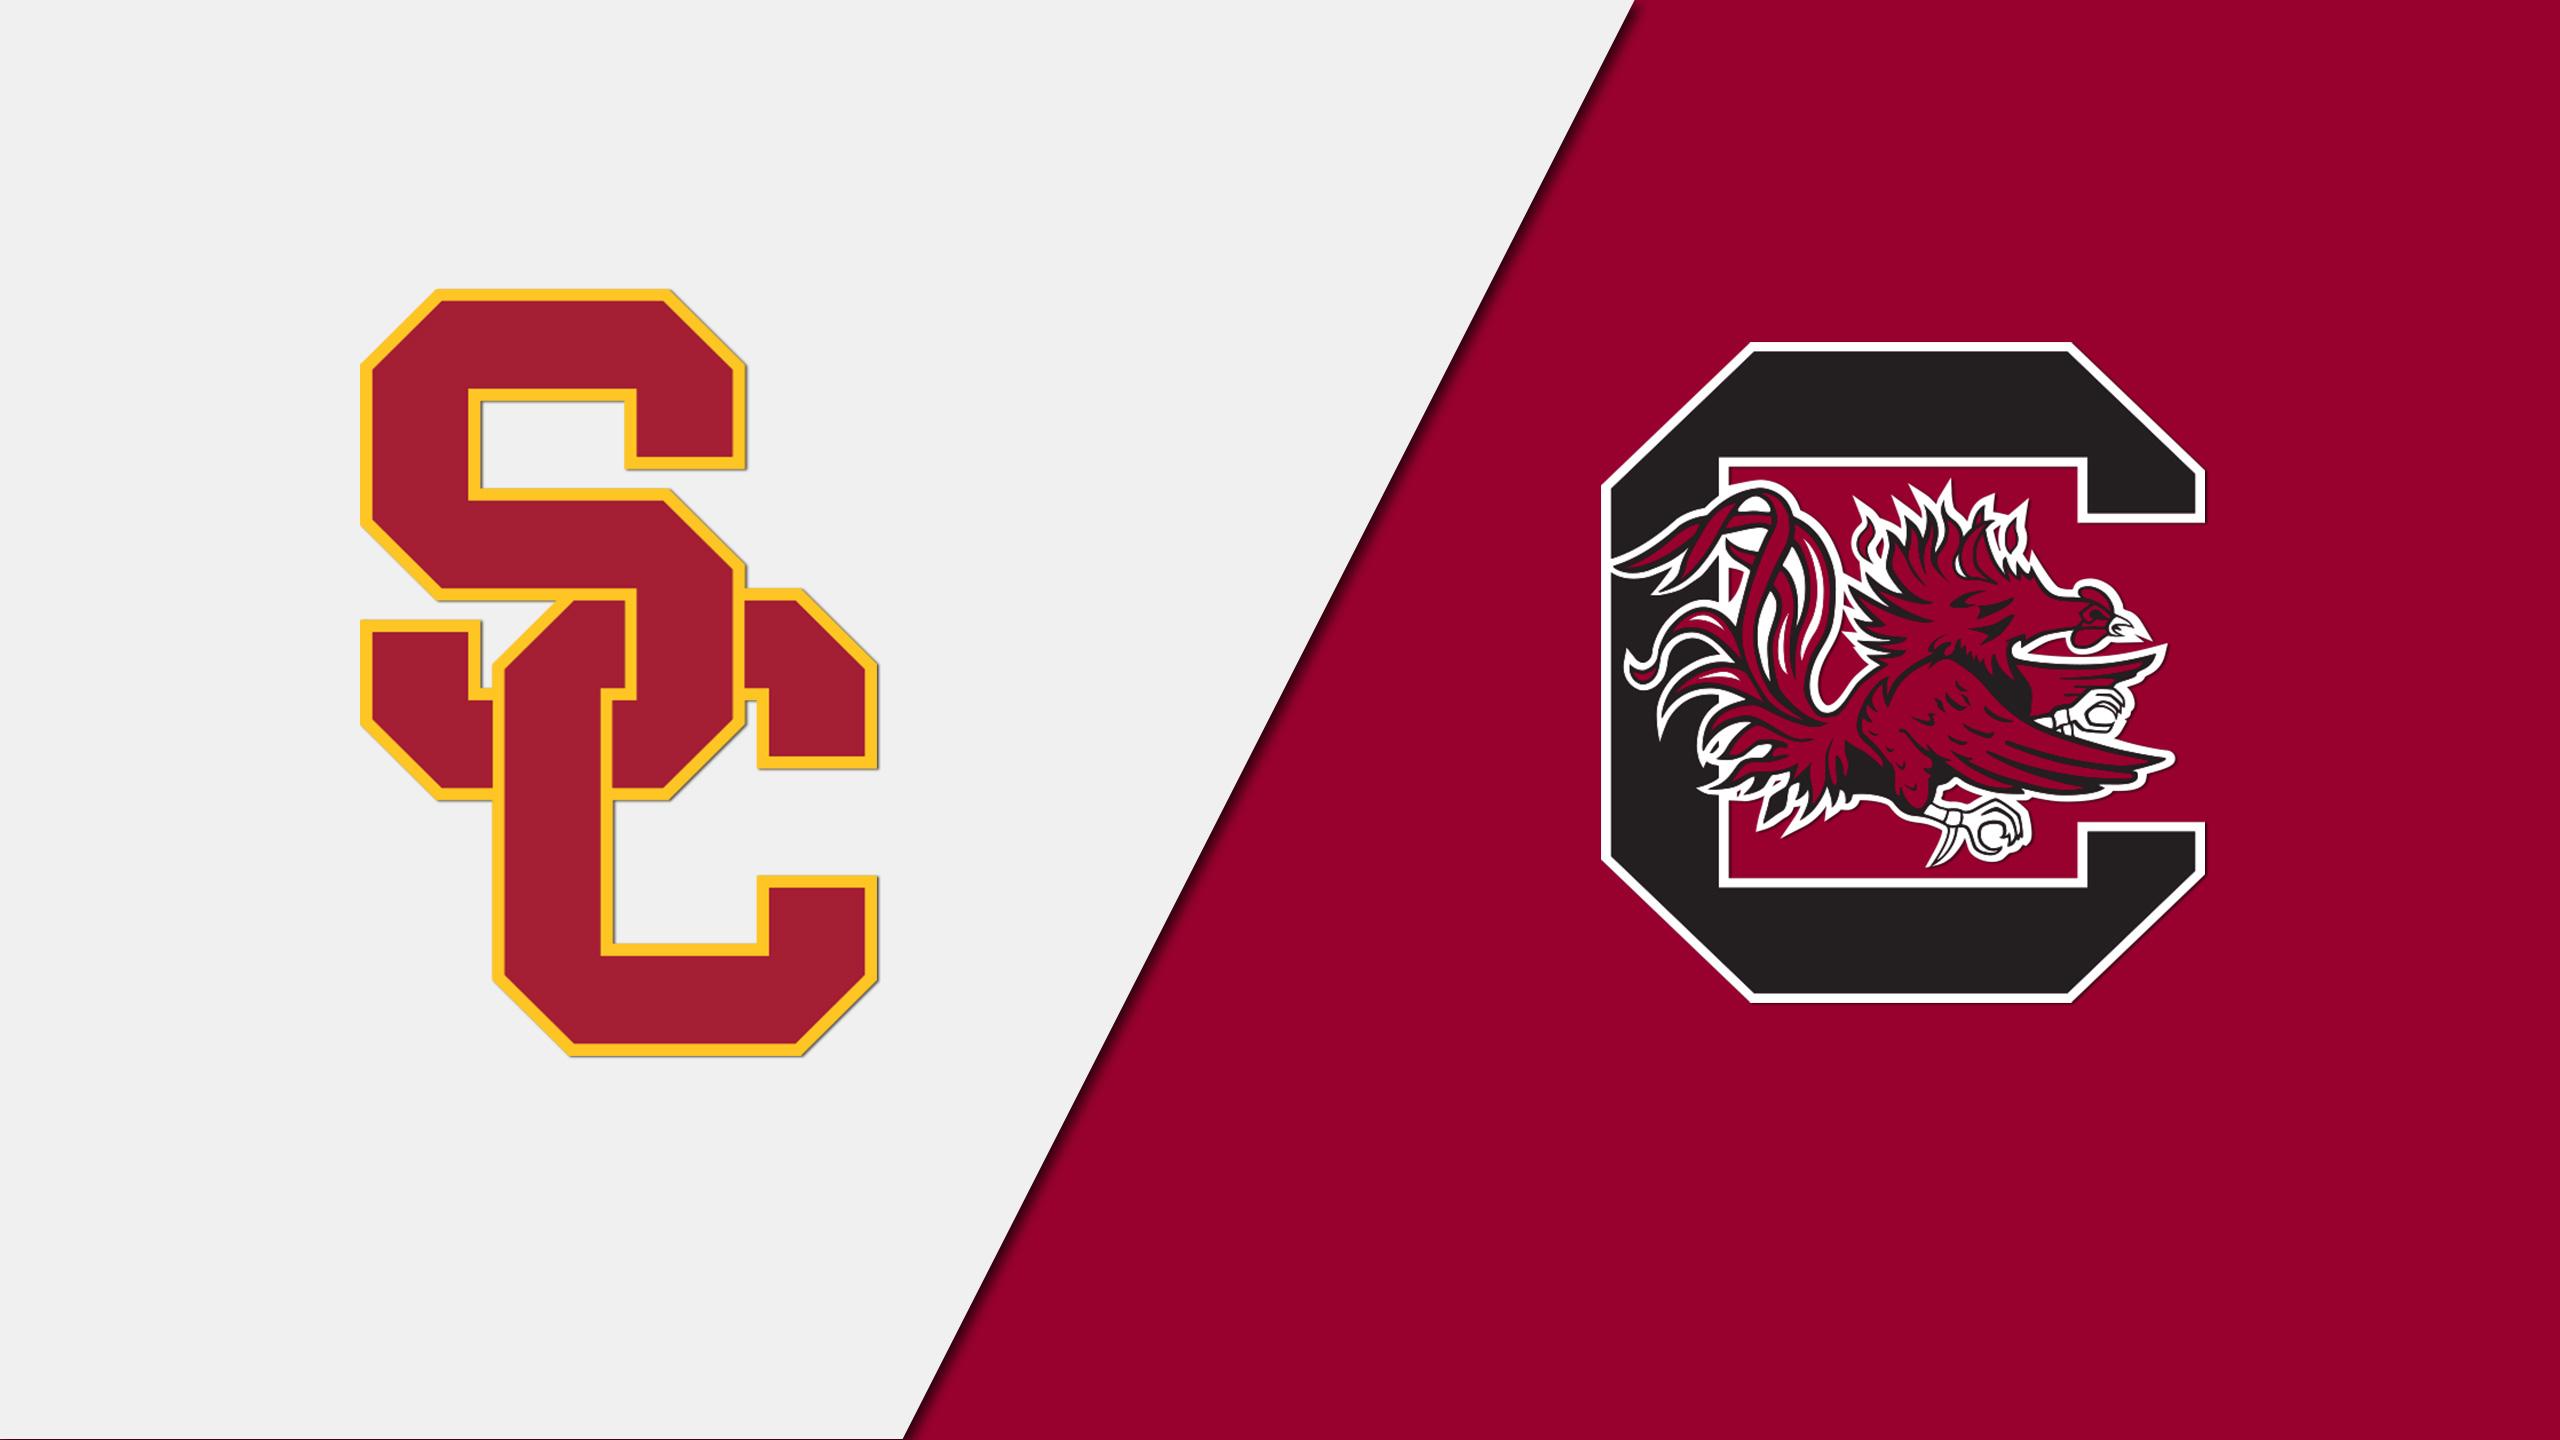 USC vs. South Carolina (Court 13) (W Tennis)